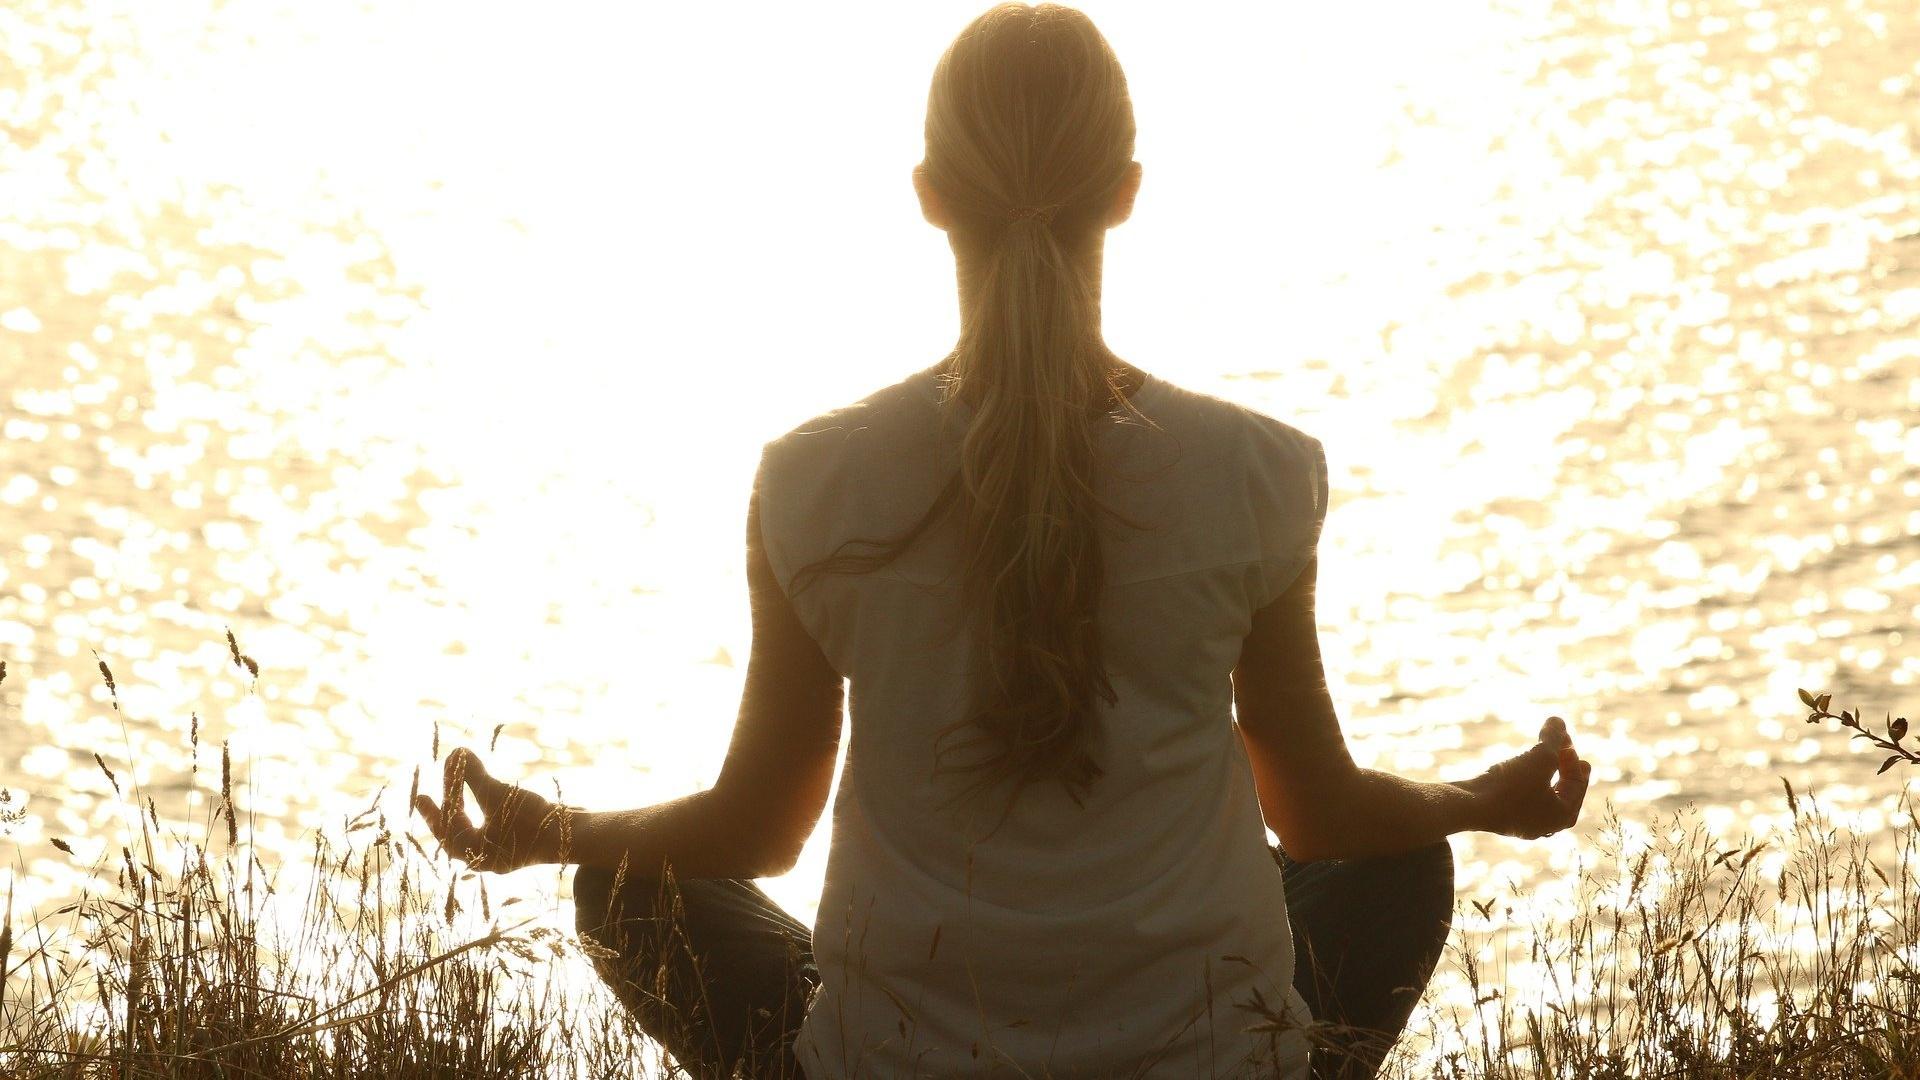 meditate-1851165_1920 Cropped